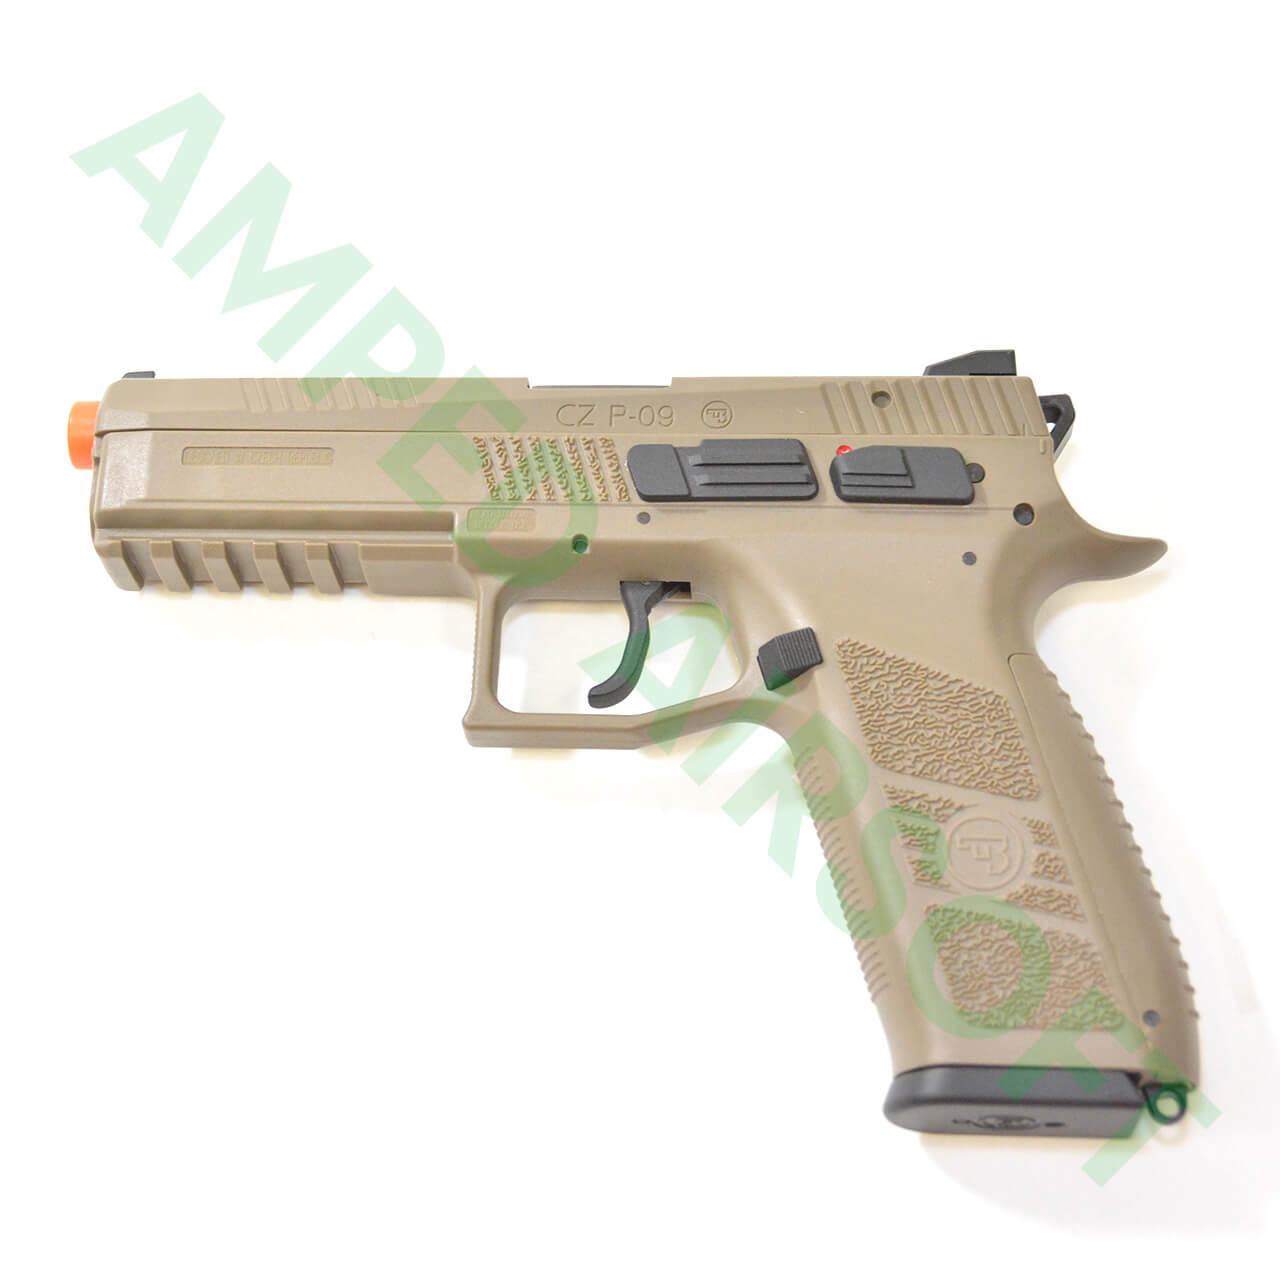 Action Sport Games - CZ 75 P-09 Polymer Gas Blowback Airsoft Pistol (FDE)